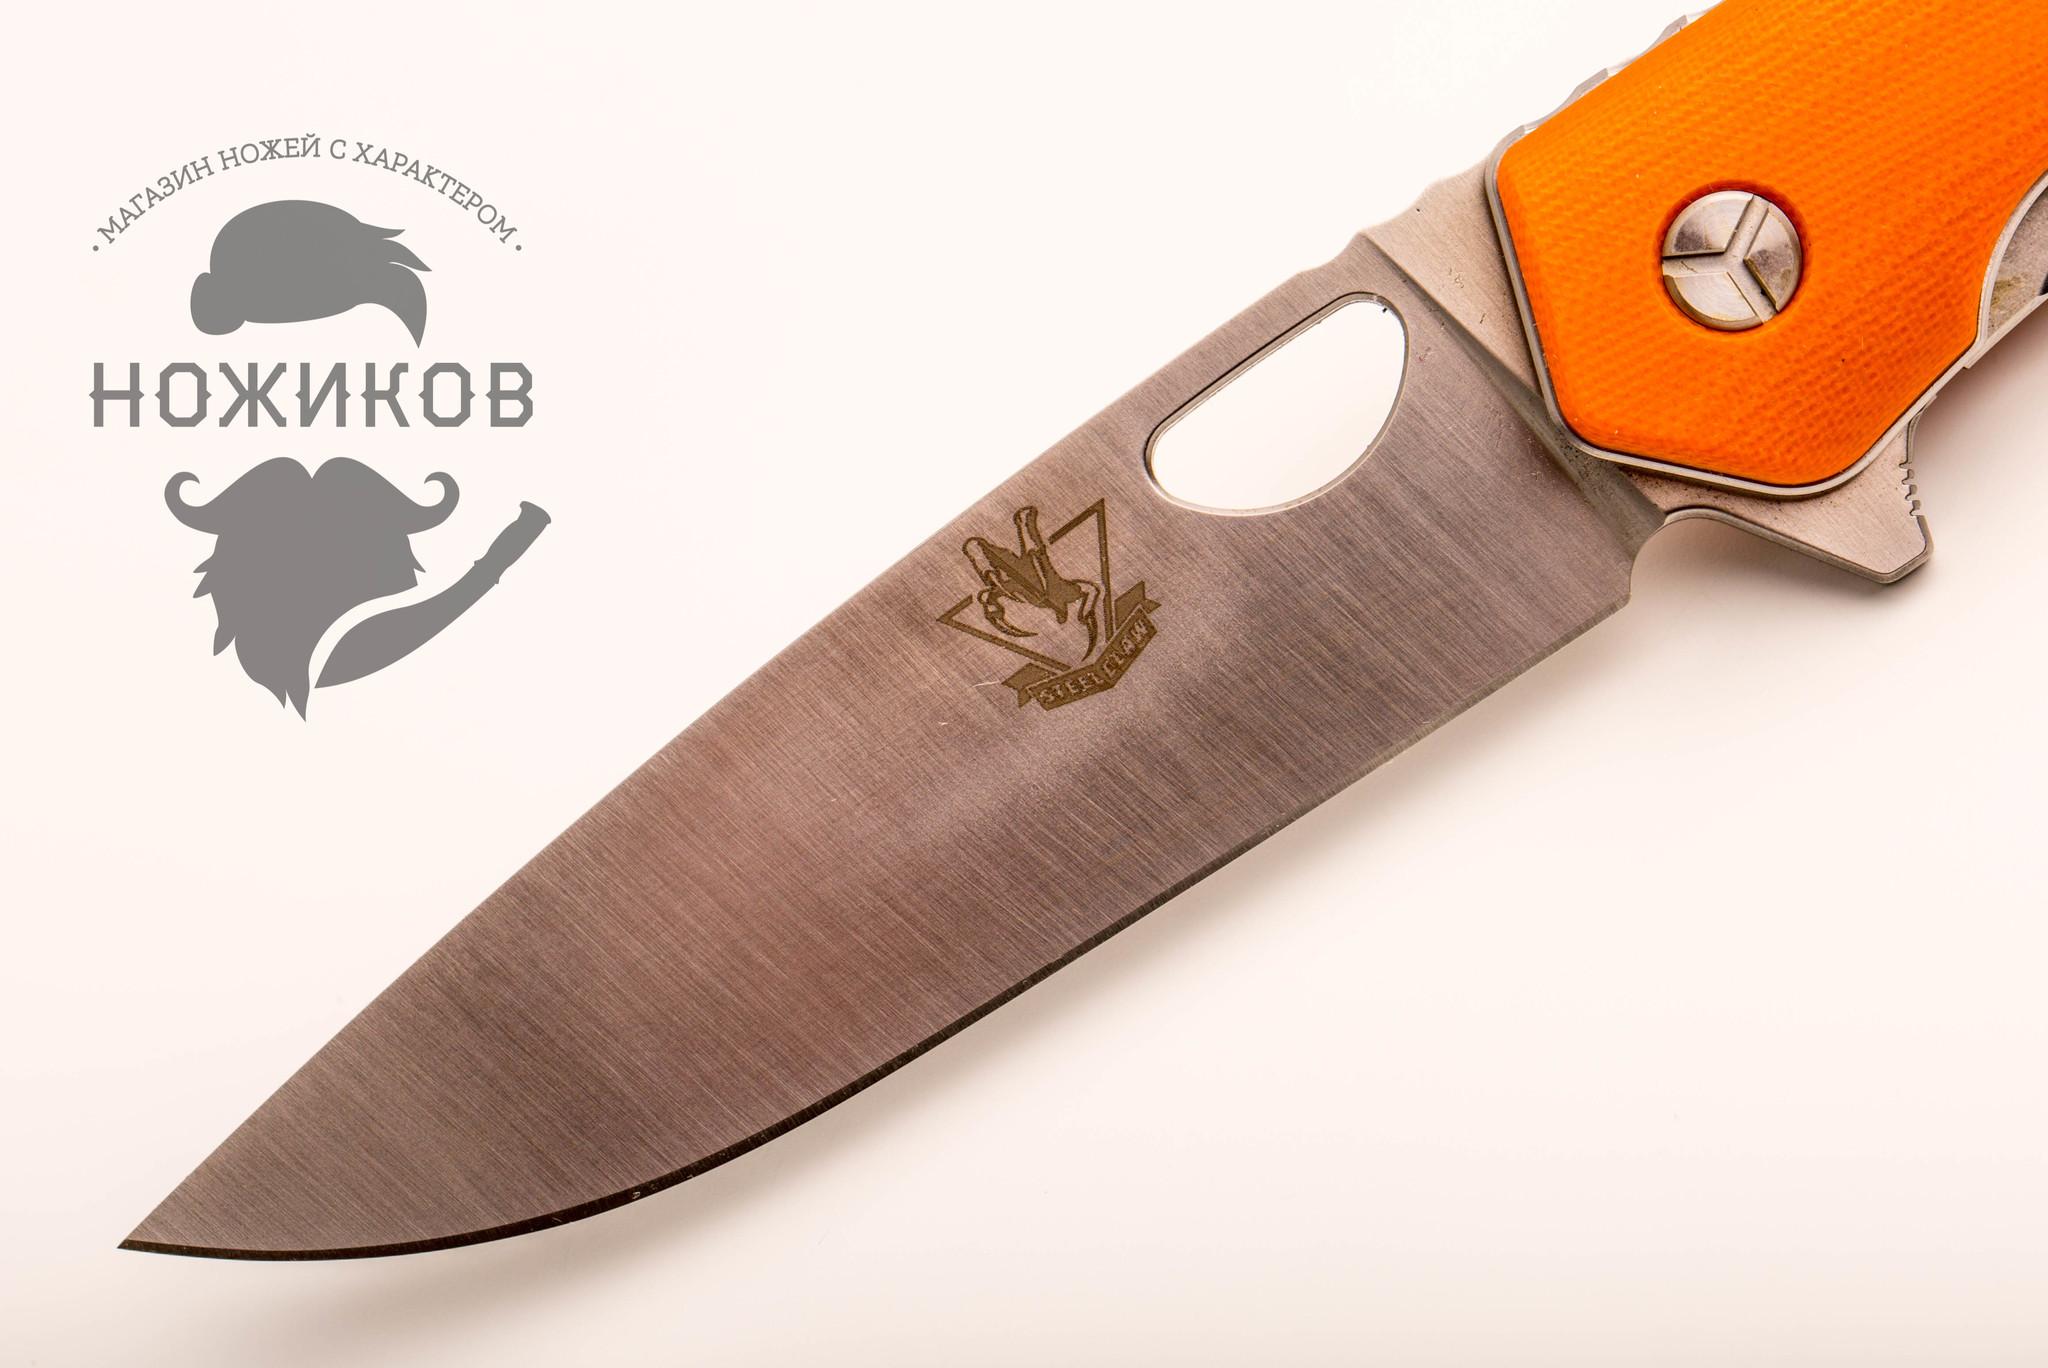 Фото 5 - Складной нож lk5016or, сталь 440C от Steelclaw